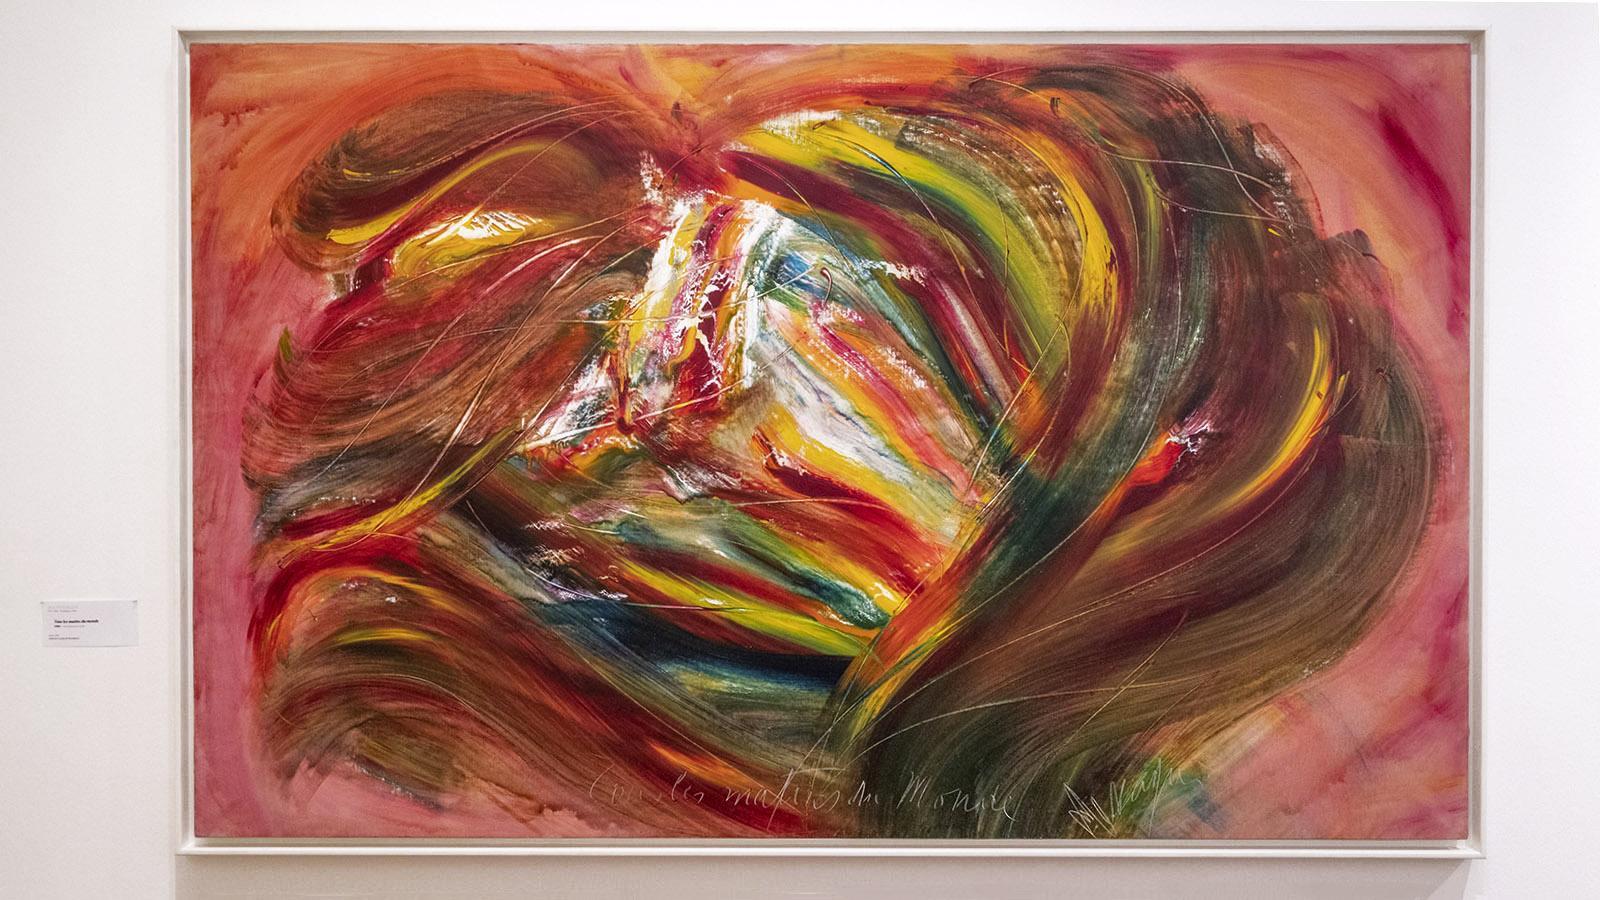 <em>Tous les matins du monde</em> heißt dieses Gemälde von Jean Messagier. Foto: Hilke Maunder